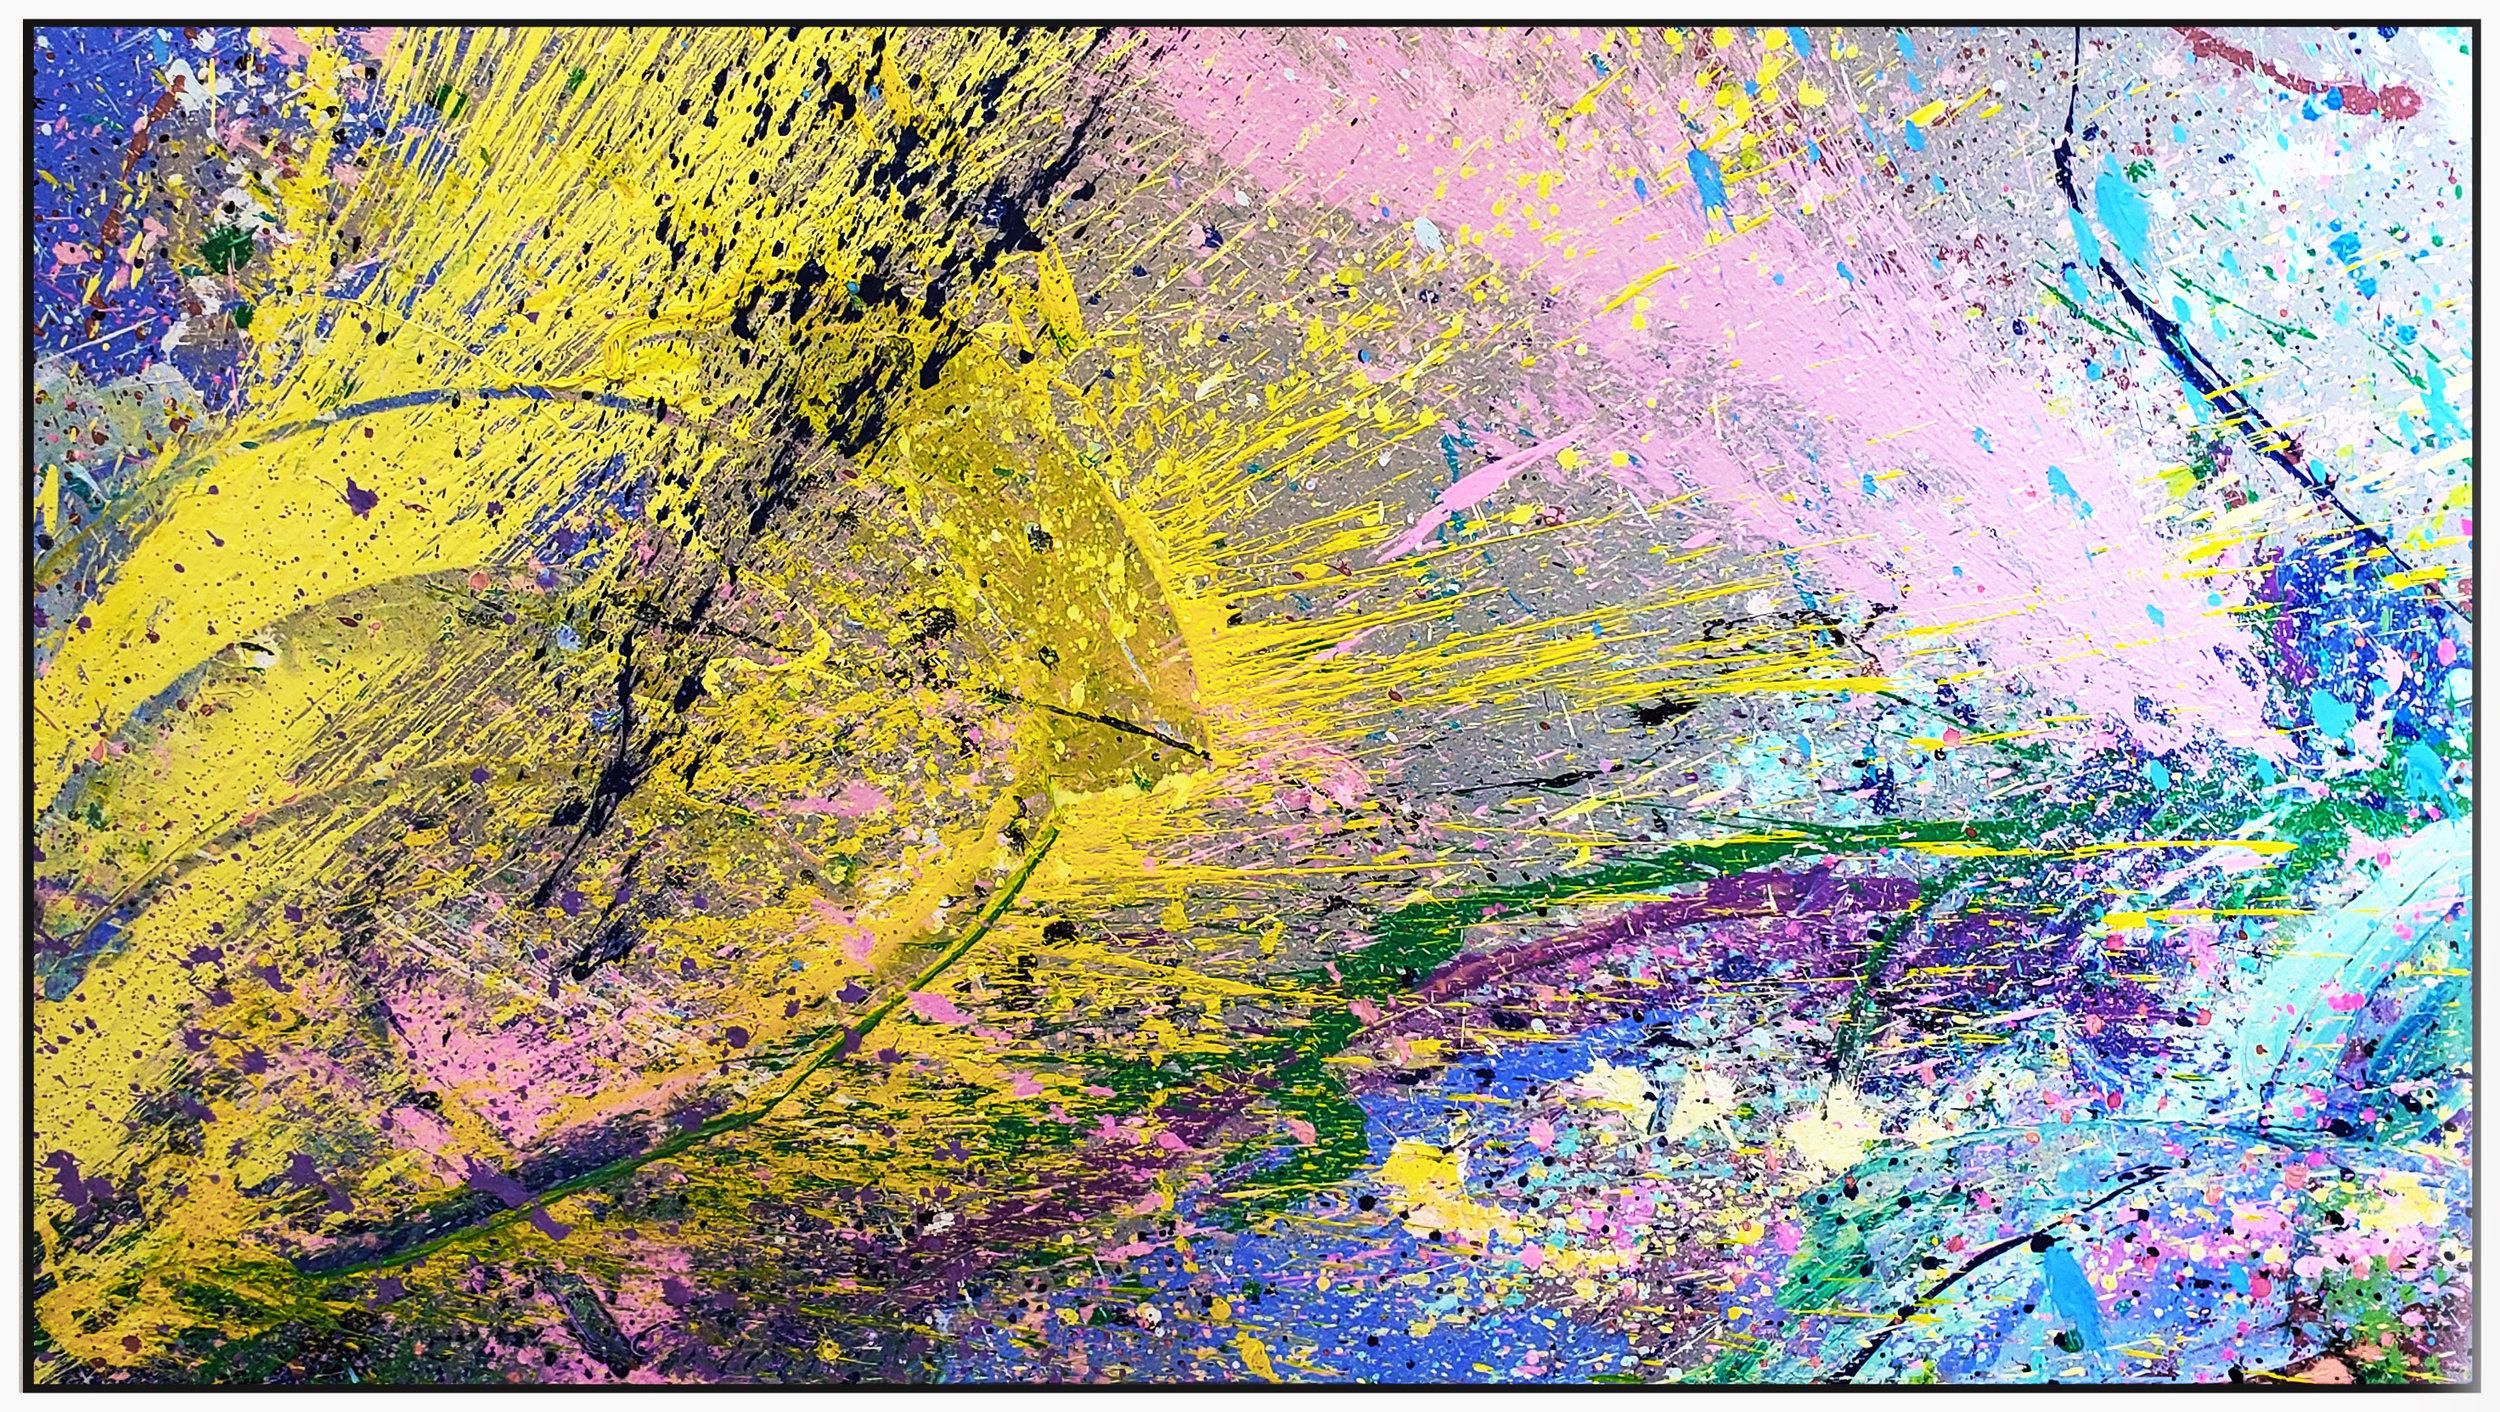 "Napa Valley #83, 2019, acrylic on canvas, 36"" x 60"" (91.4 x 152.4 cm)"